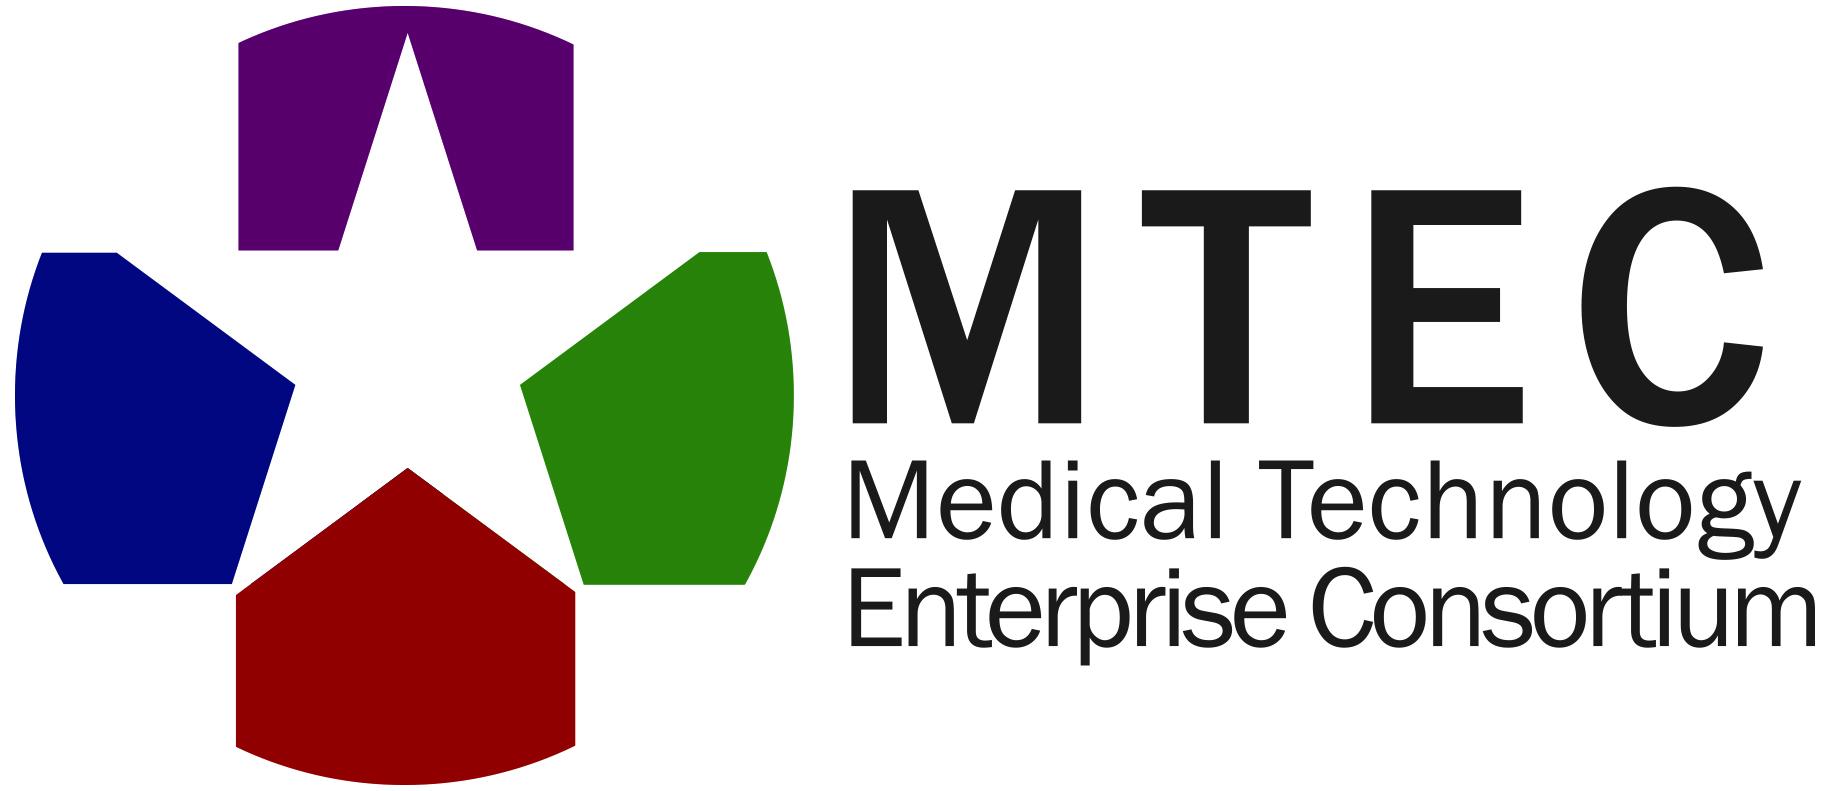 Medical Technology Enterprise Consortium (MTEC)